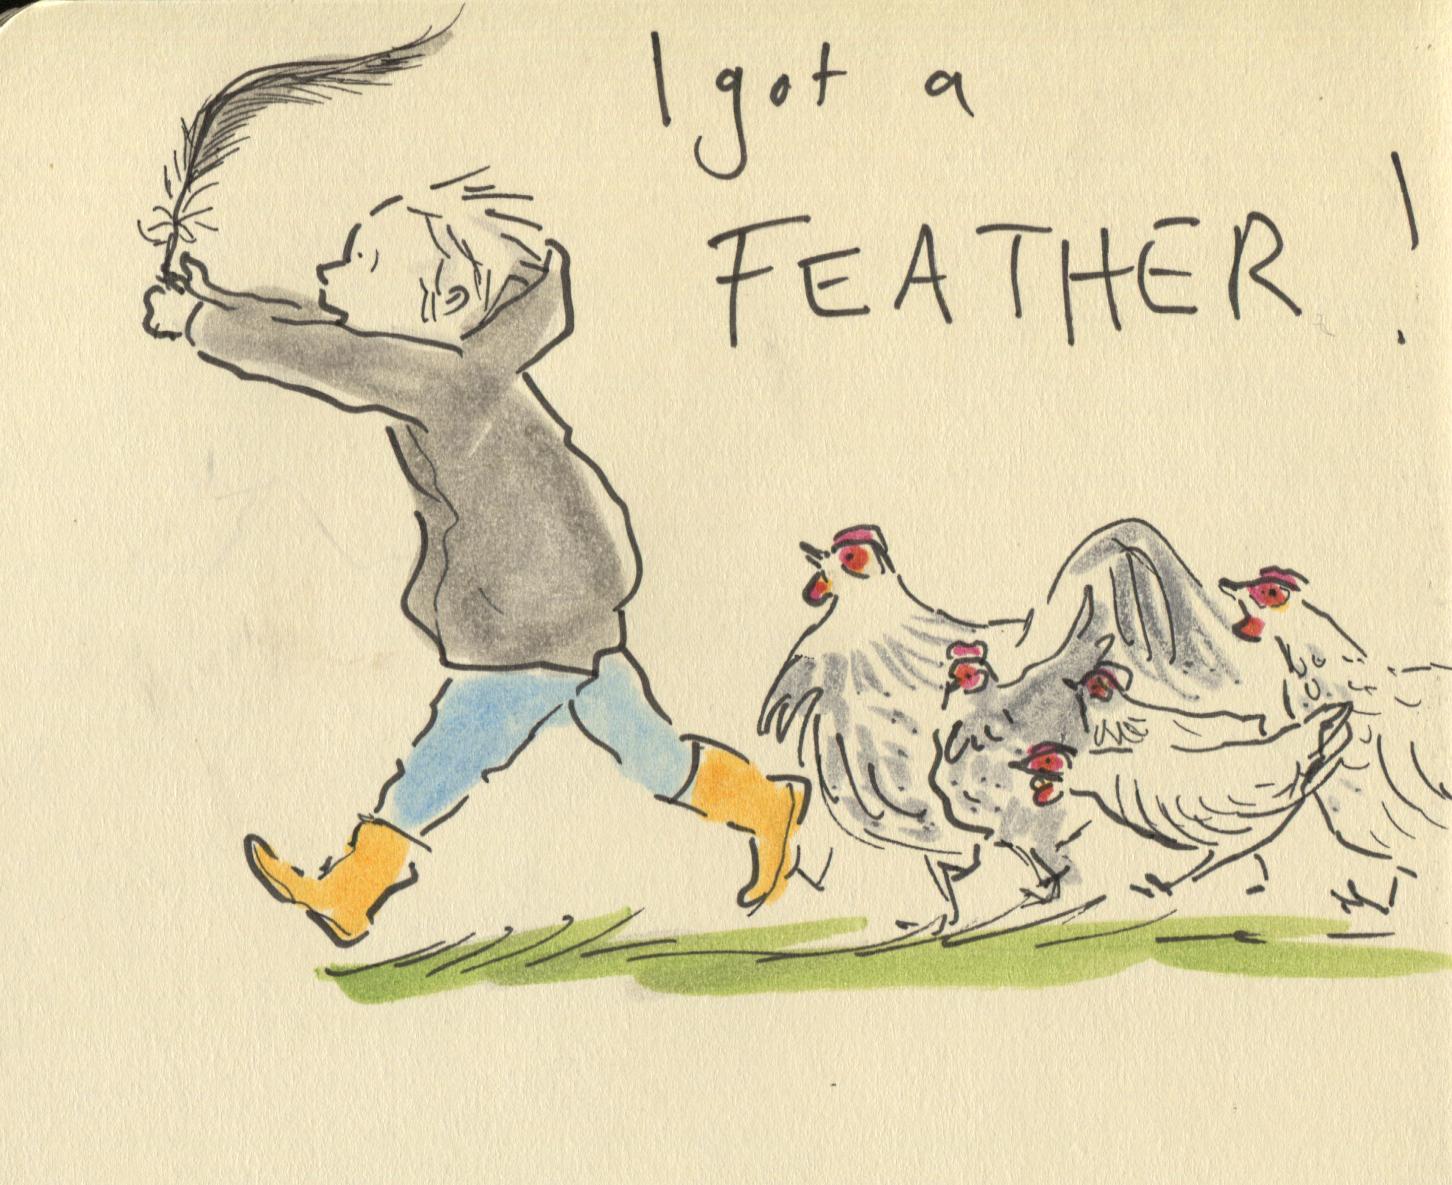 treasure feather